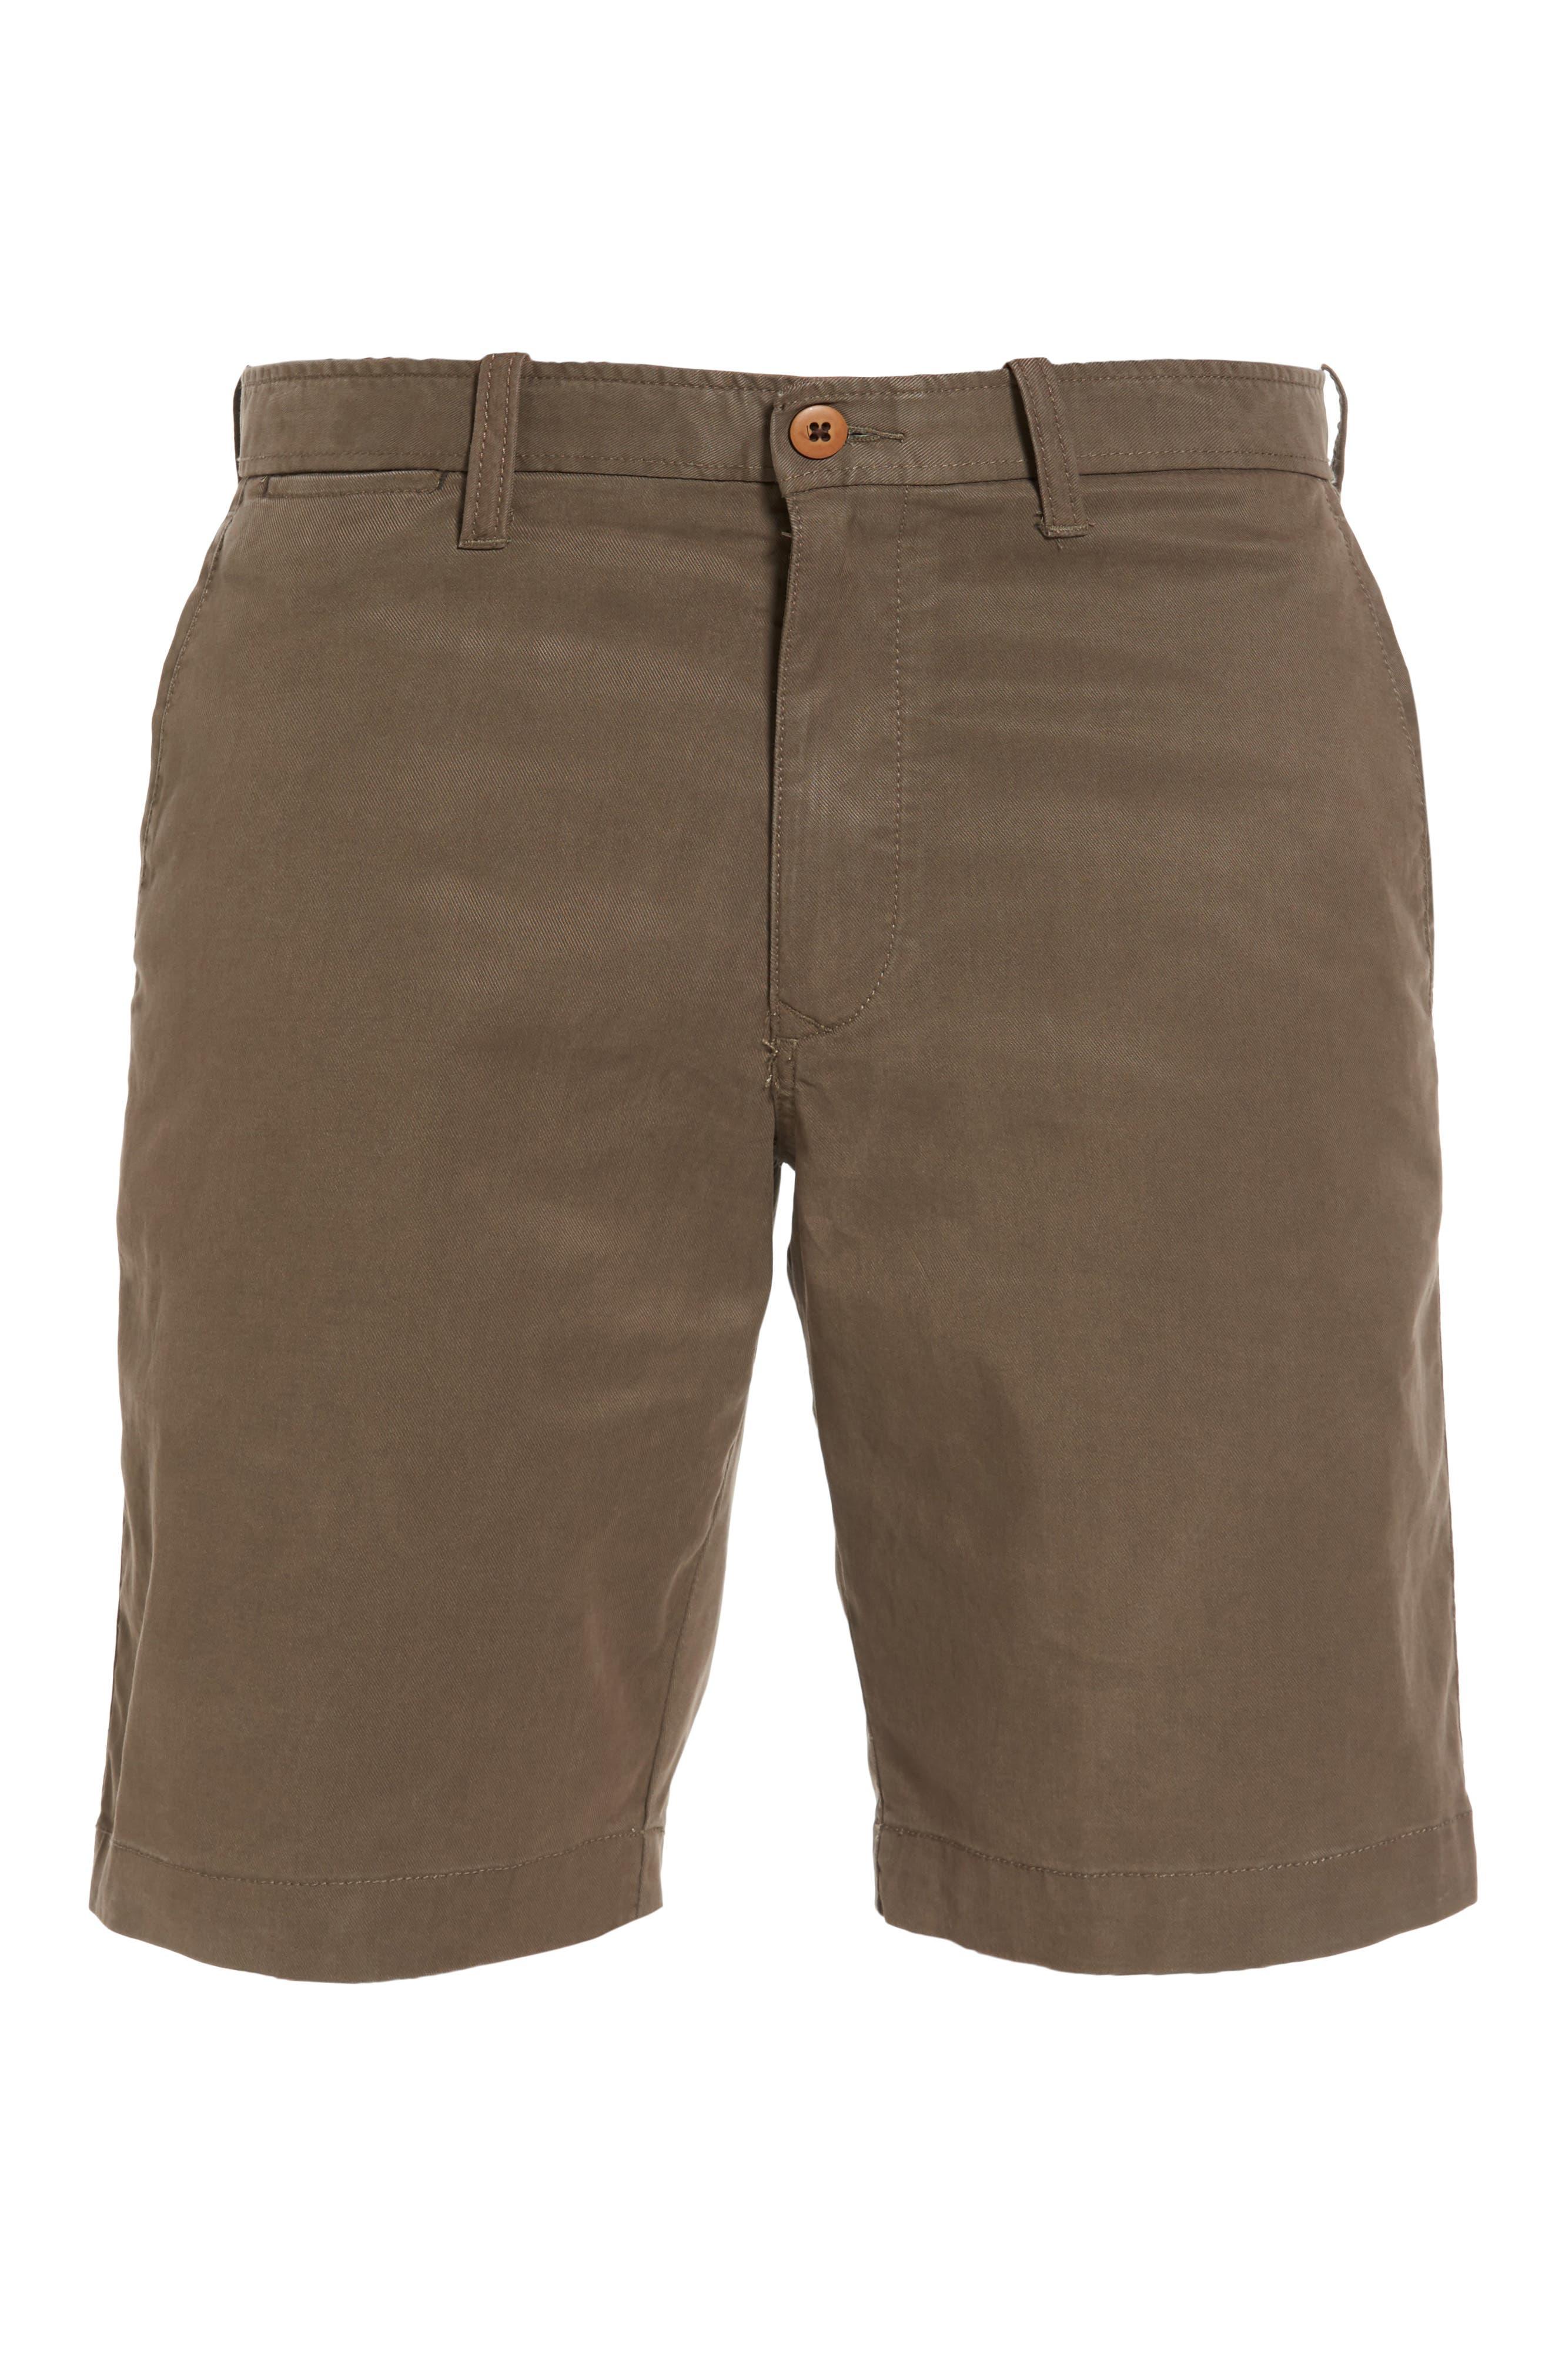 'Offshore' Flat Front Shorts,                             Alternate thumbnail 43, color,